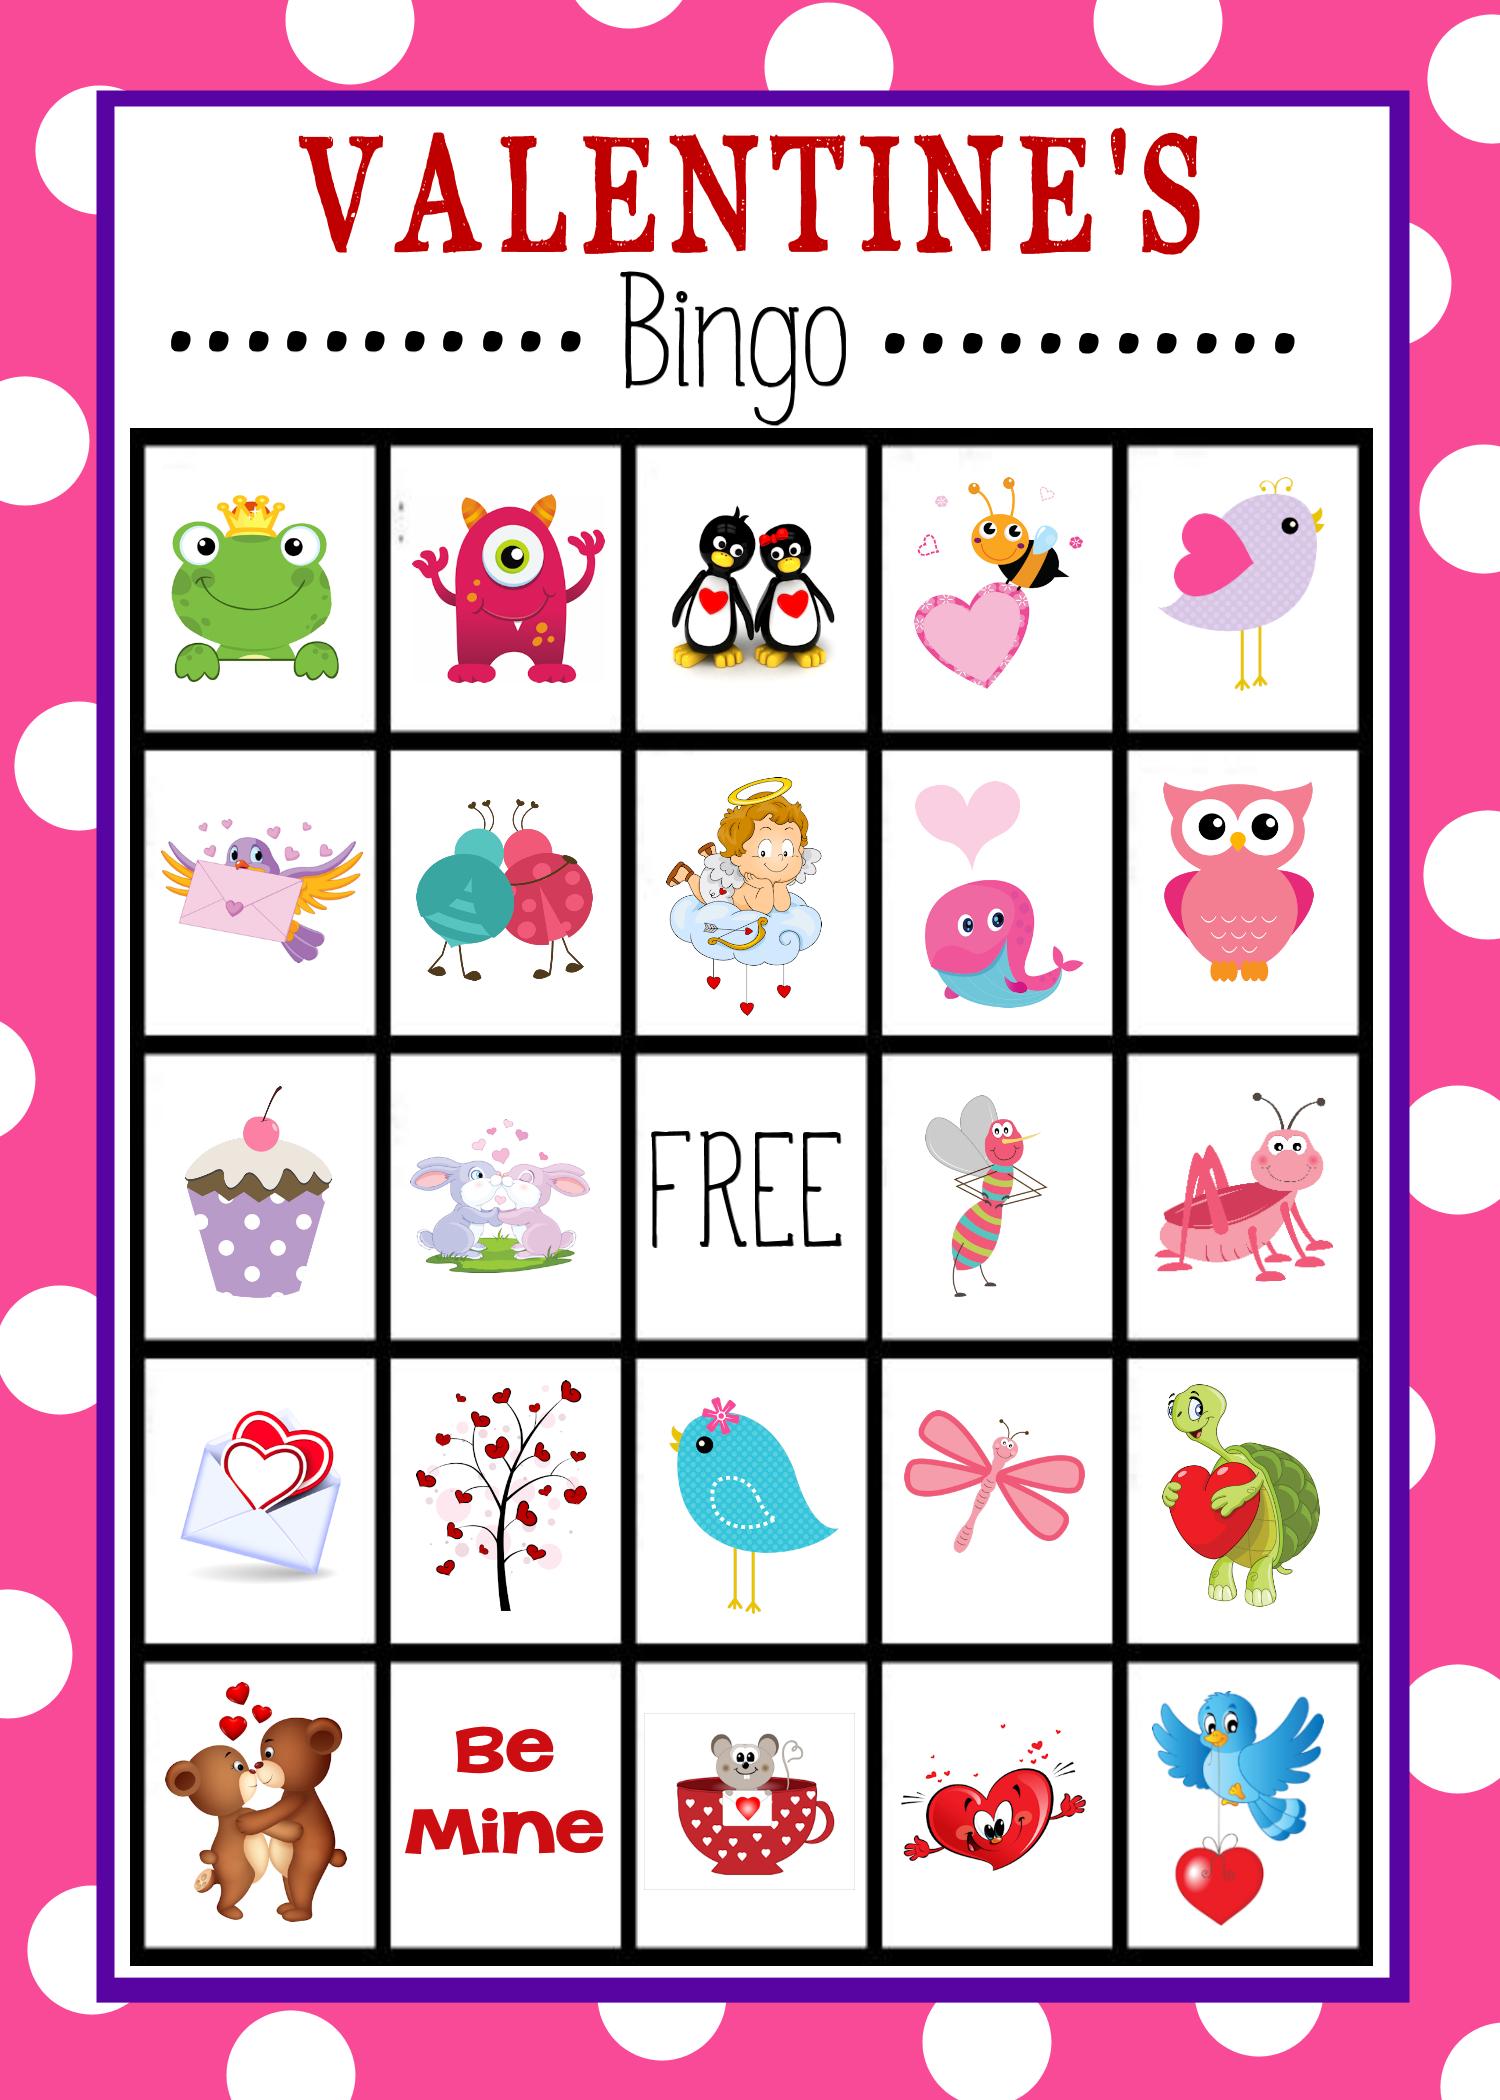 Free Printable Valentine's Day Bingo Game | Valentine's Day - Free Printable Valentines Bingo